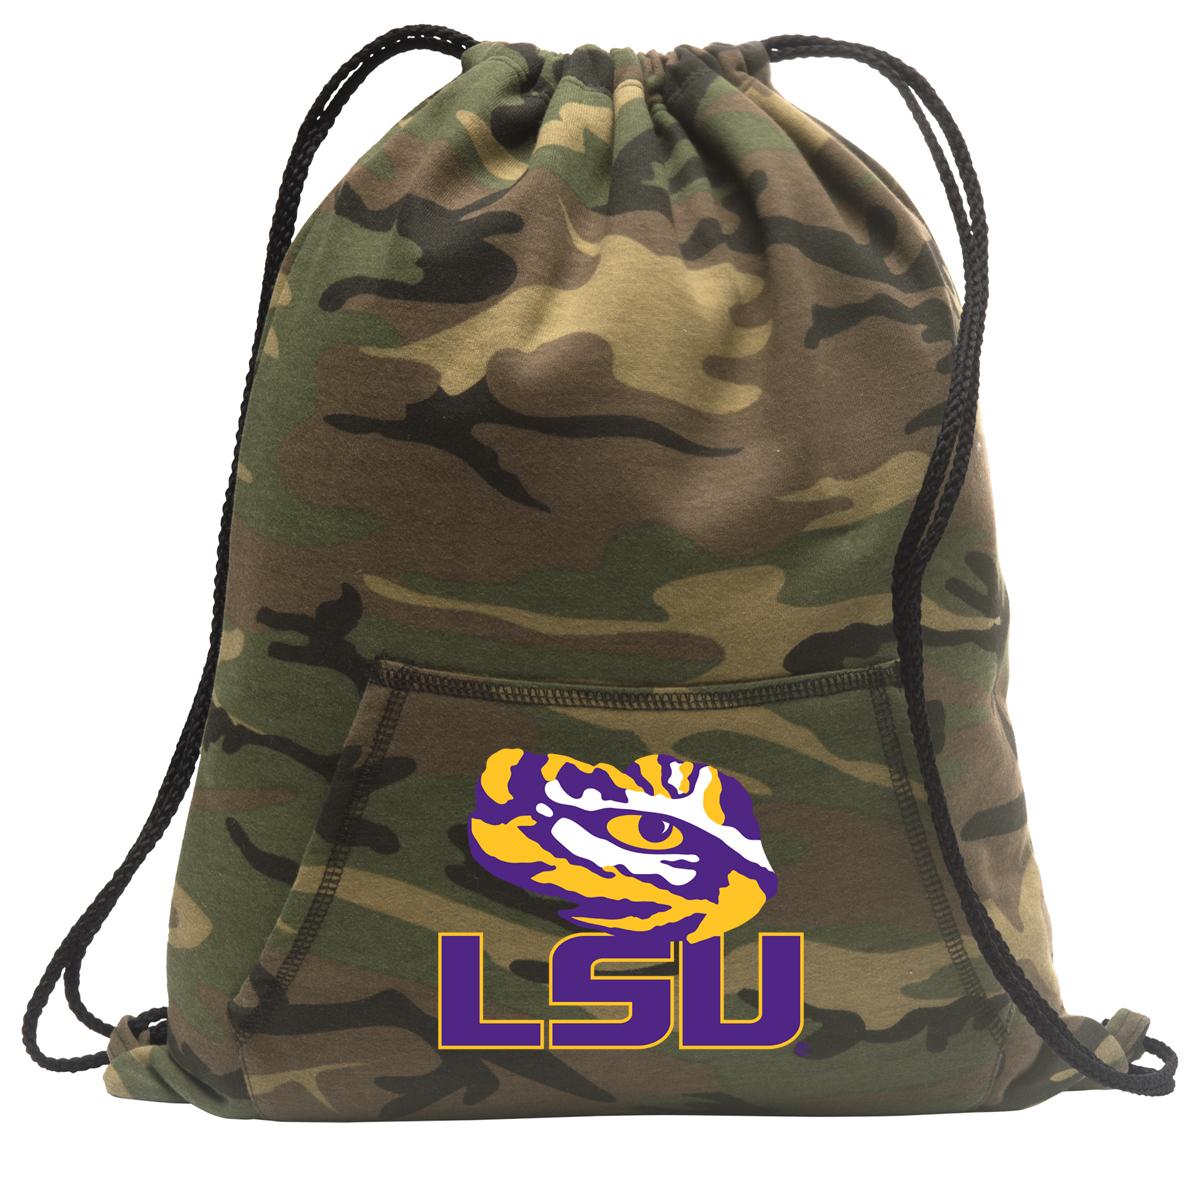 Broad Bay Camo LSU Cinch Bag Cool Hoody Cinch Backpack